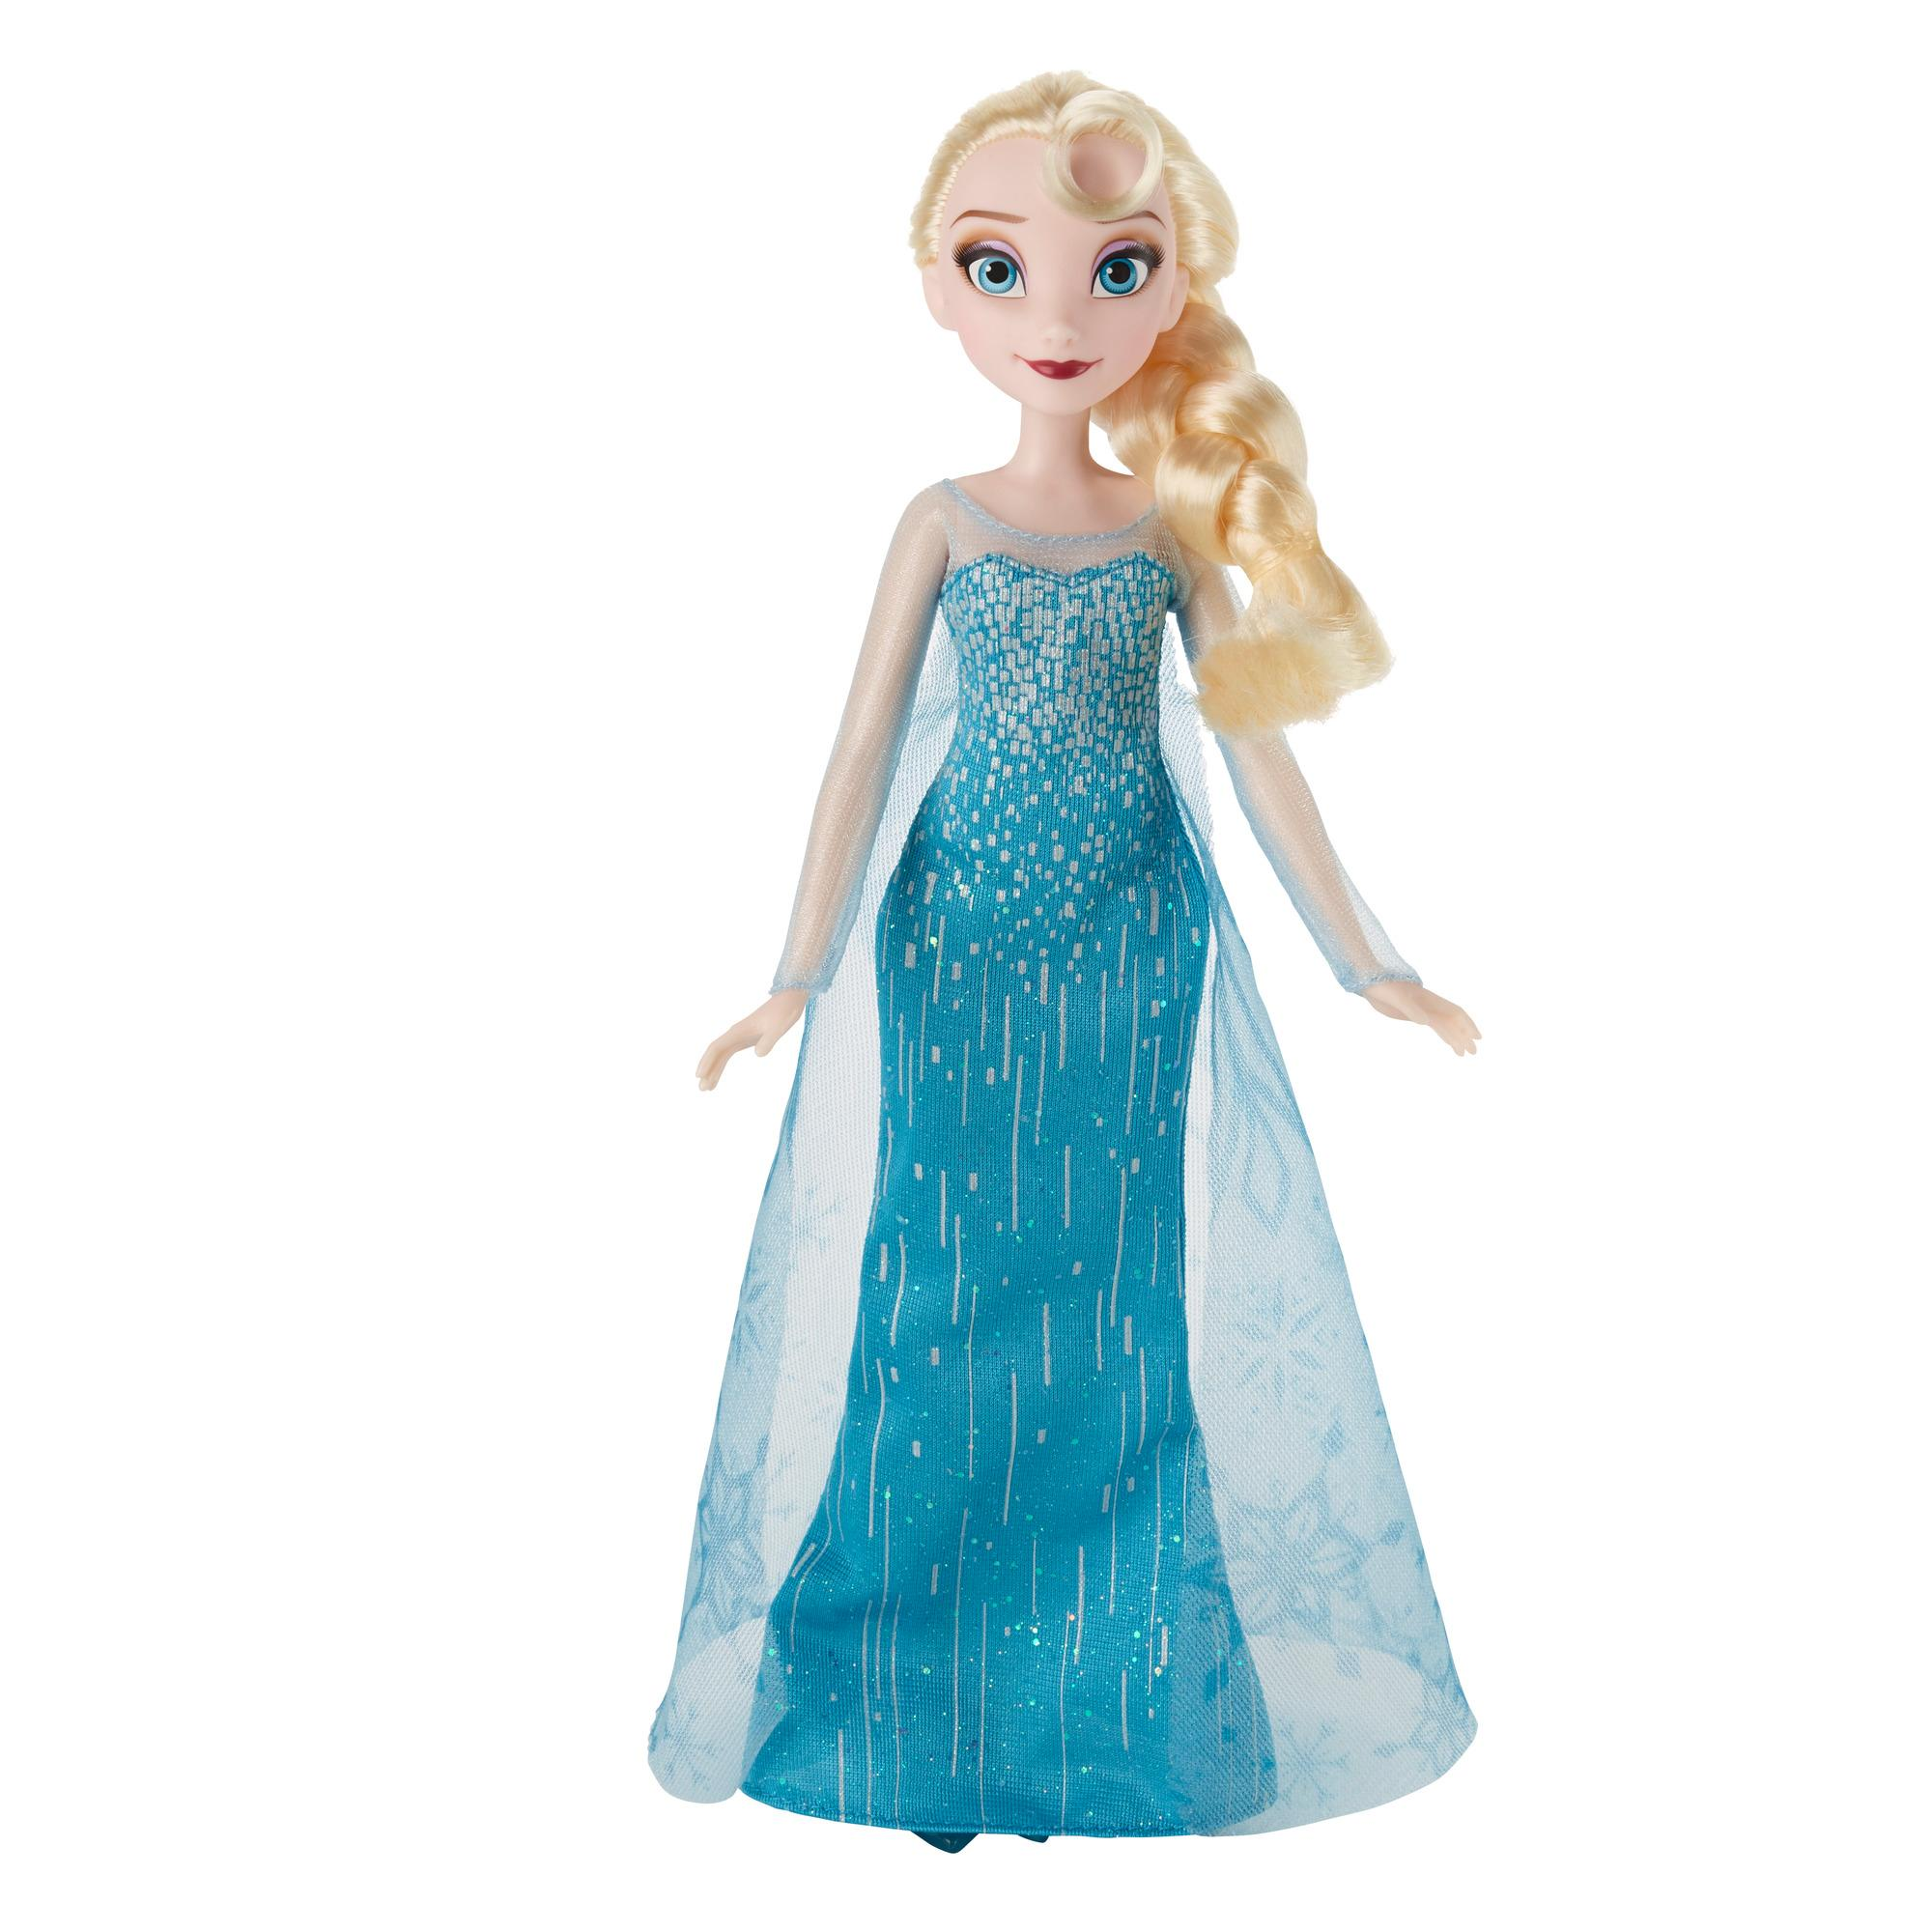 Elsa Moda Clásica de Frozen Una aventura congelada de Disney